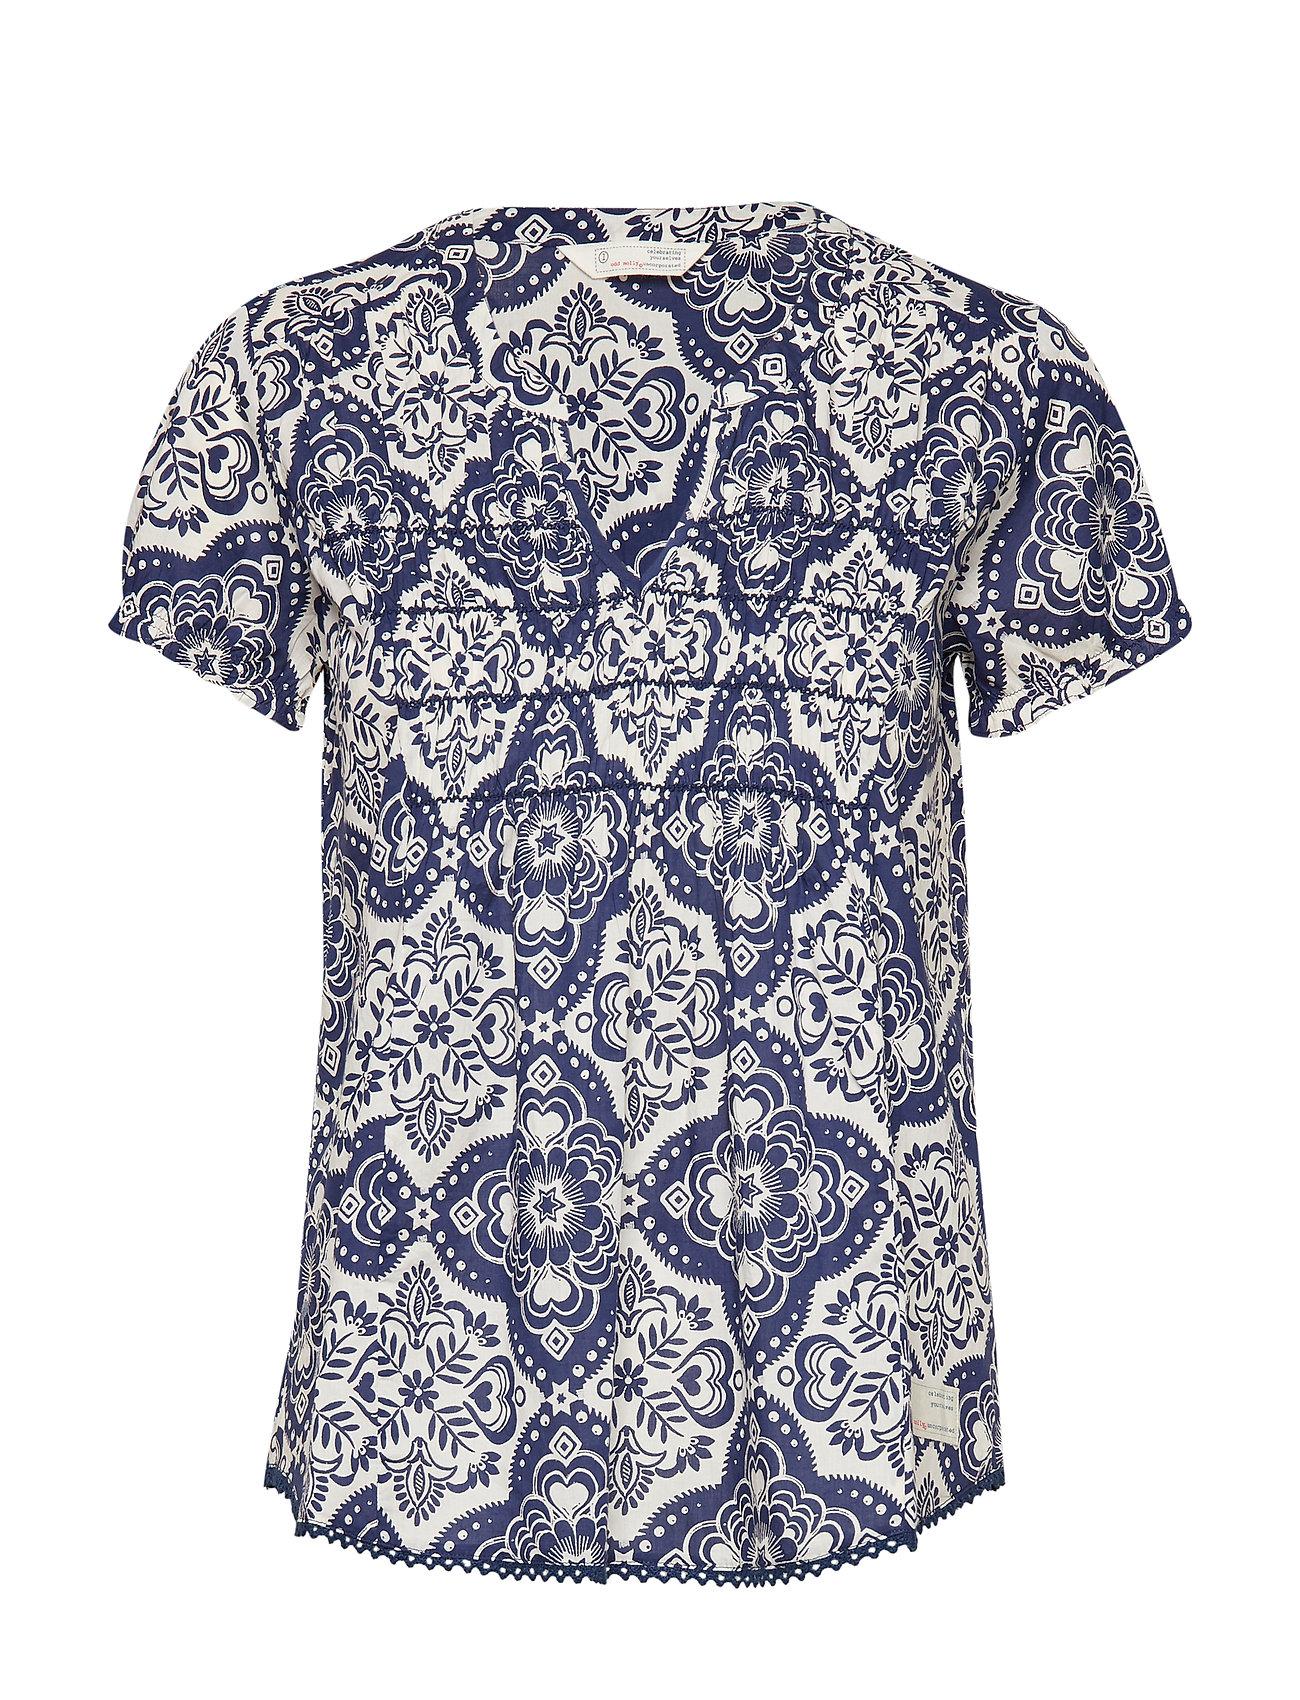 ODD MOLLY no limit blouse - NIGHTFALL BLUE